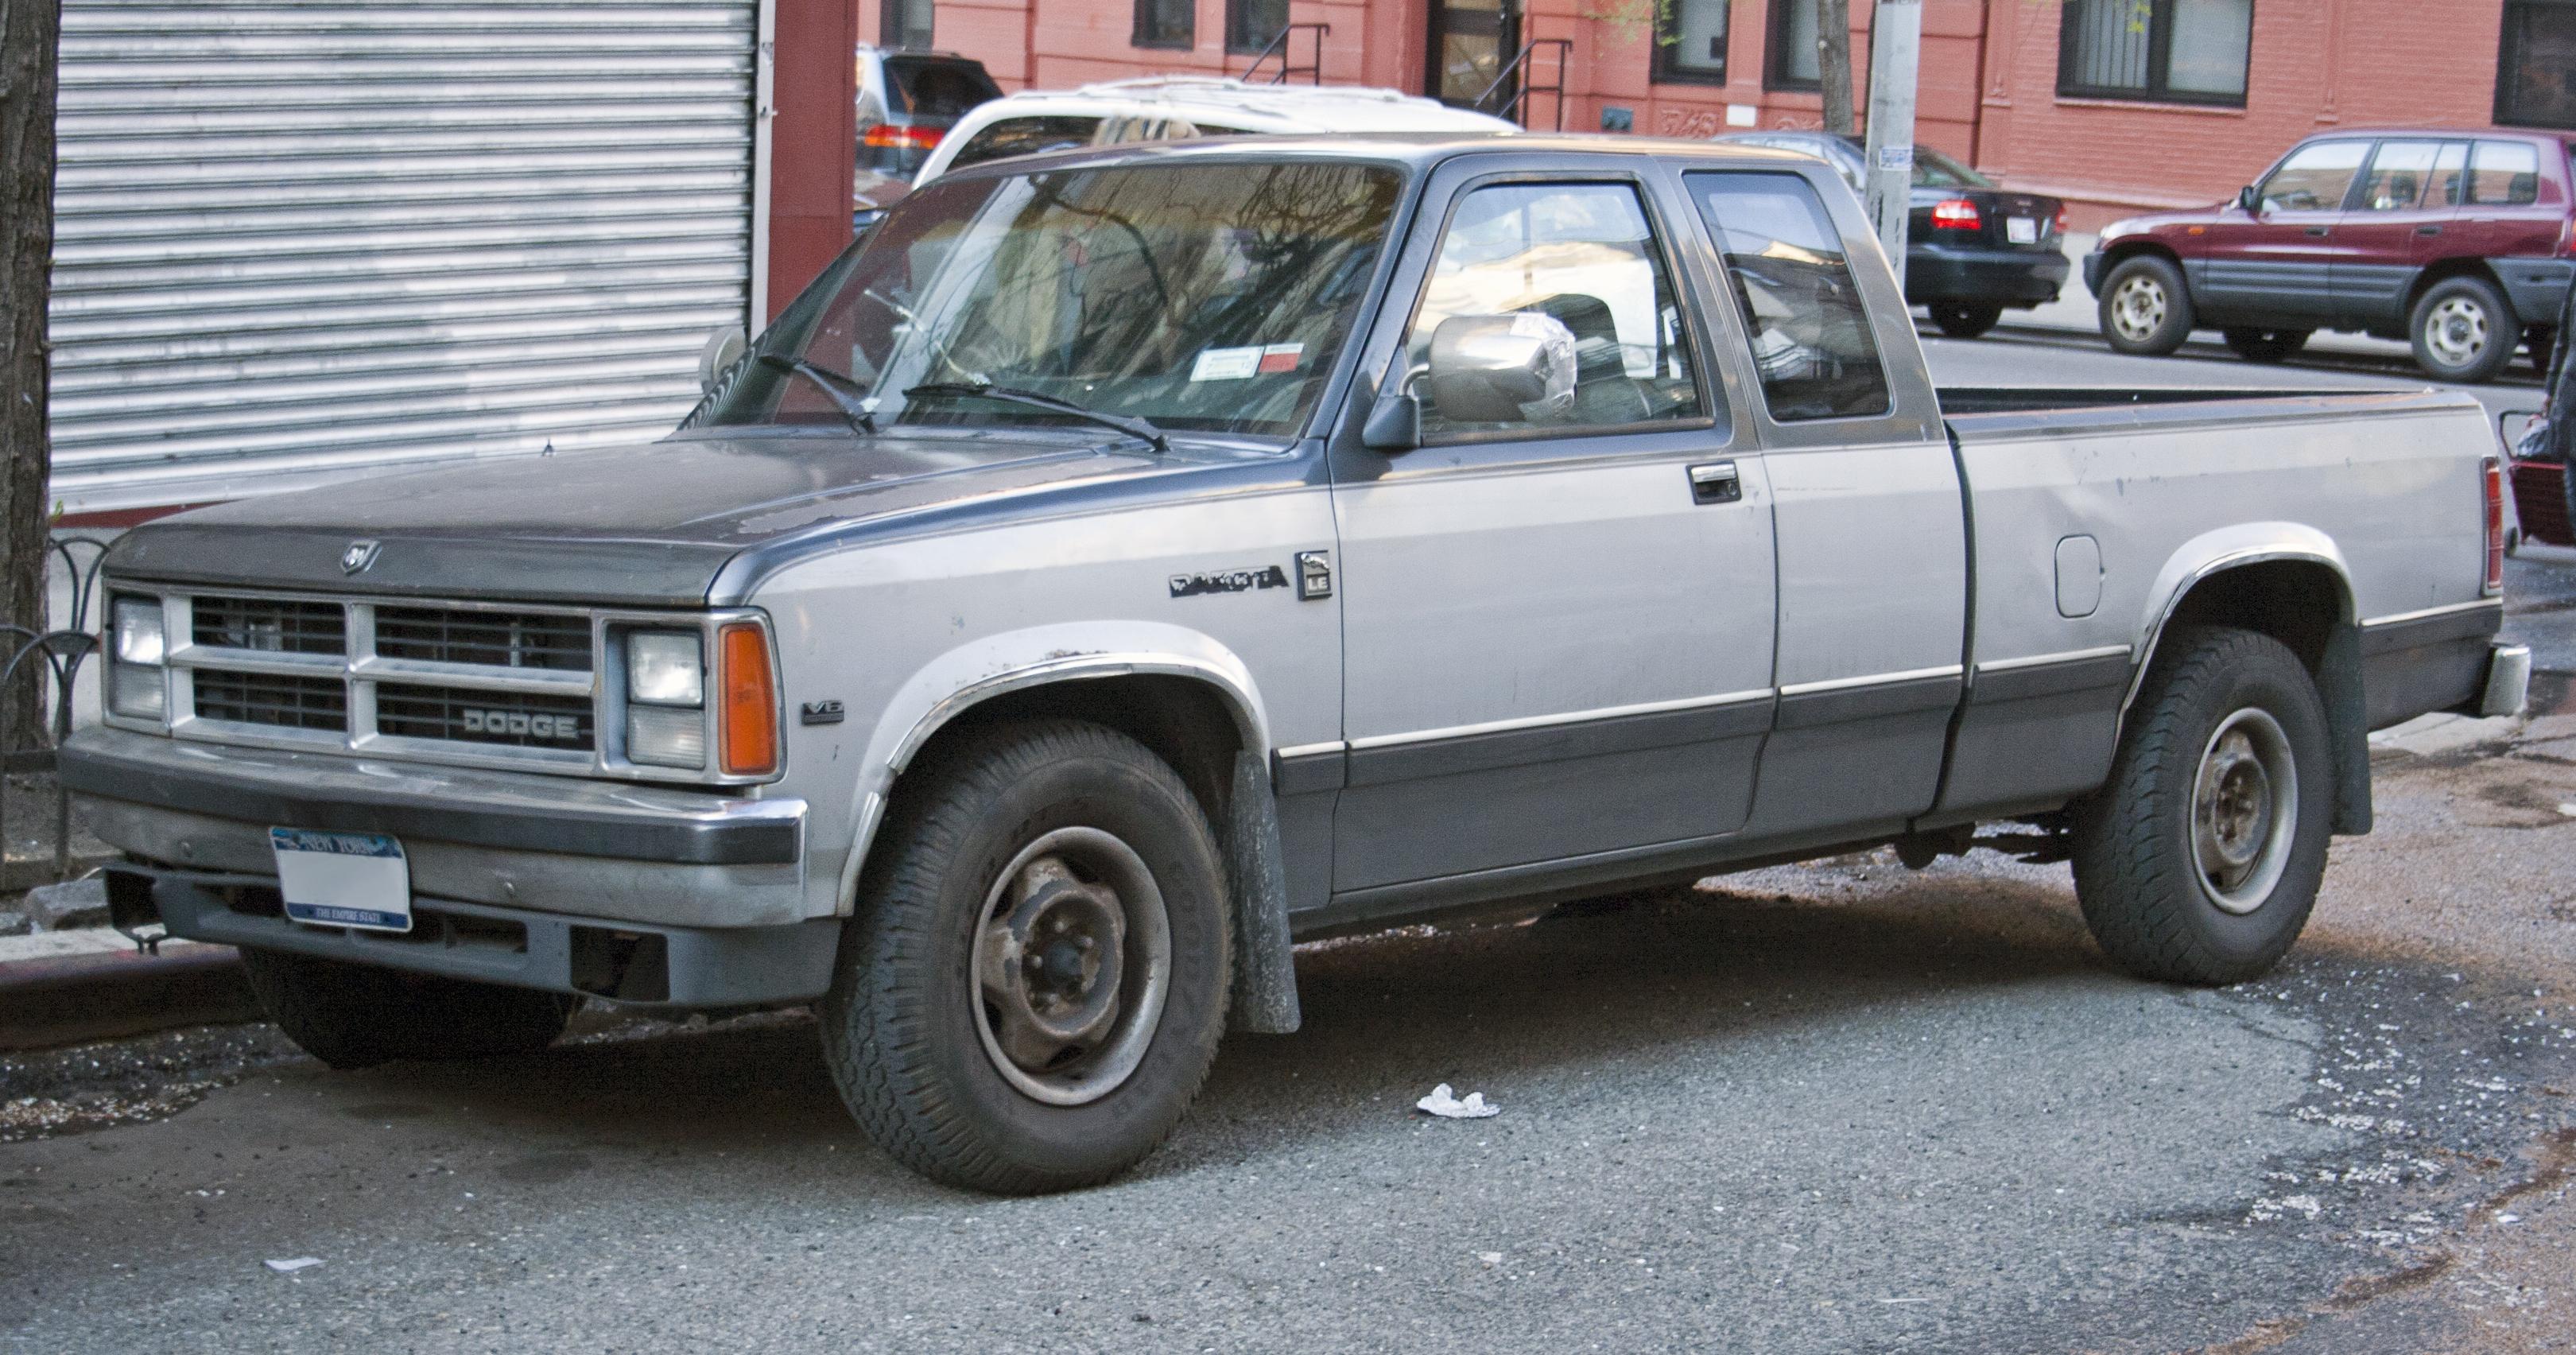 Dodge Dakota on 1990 Dodge Dakota Extended Cab